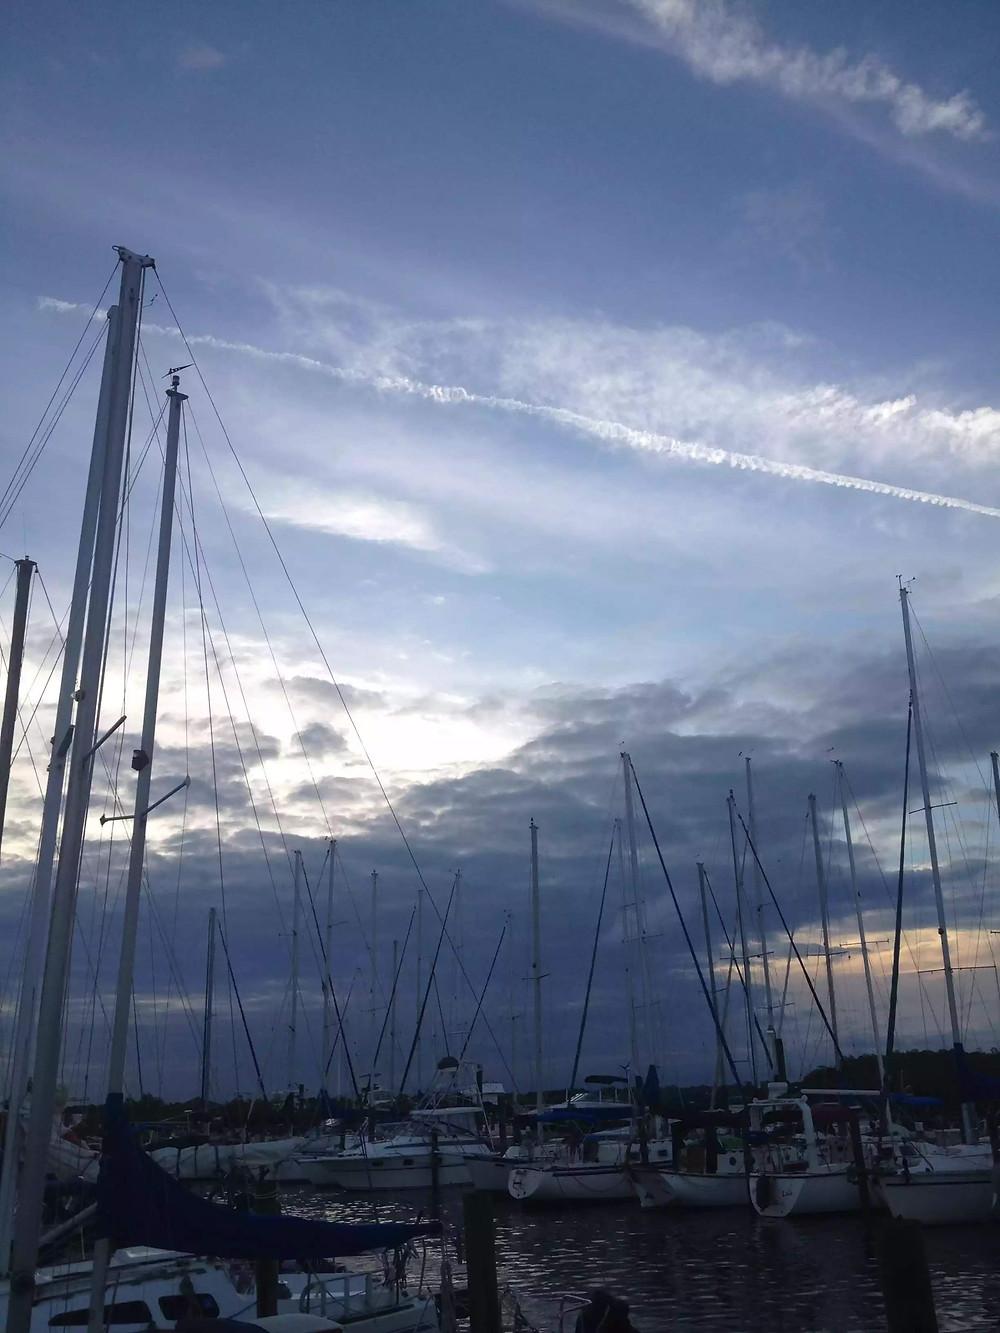 Daytona Dockyard